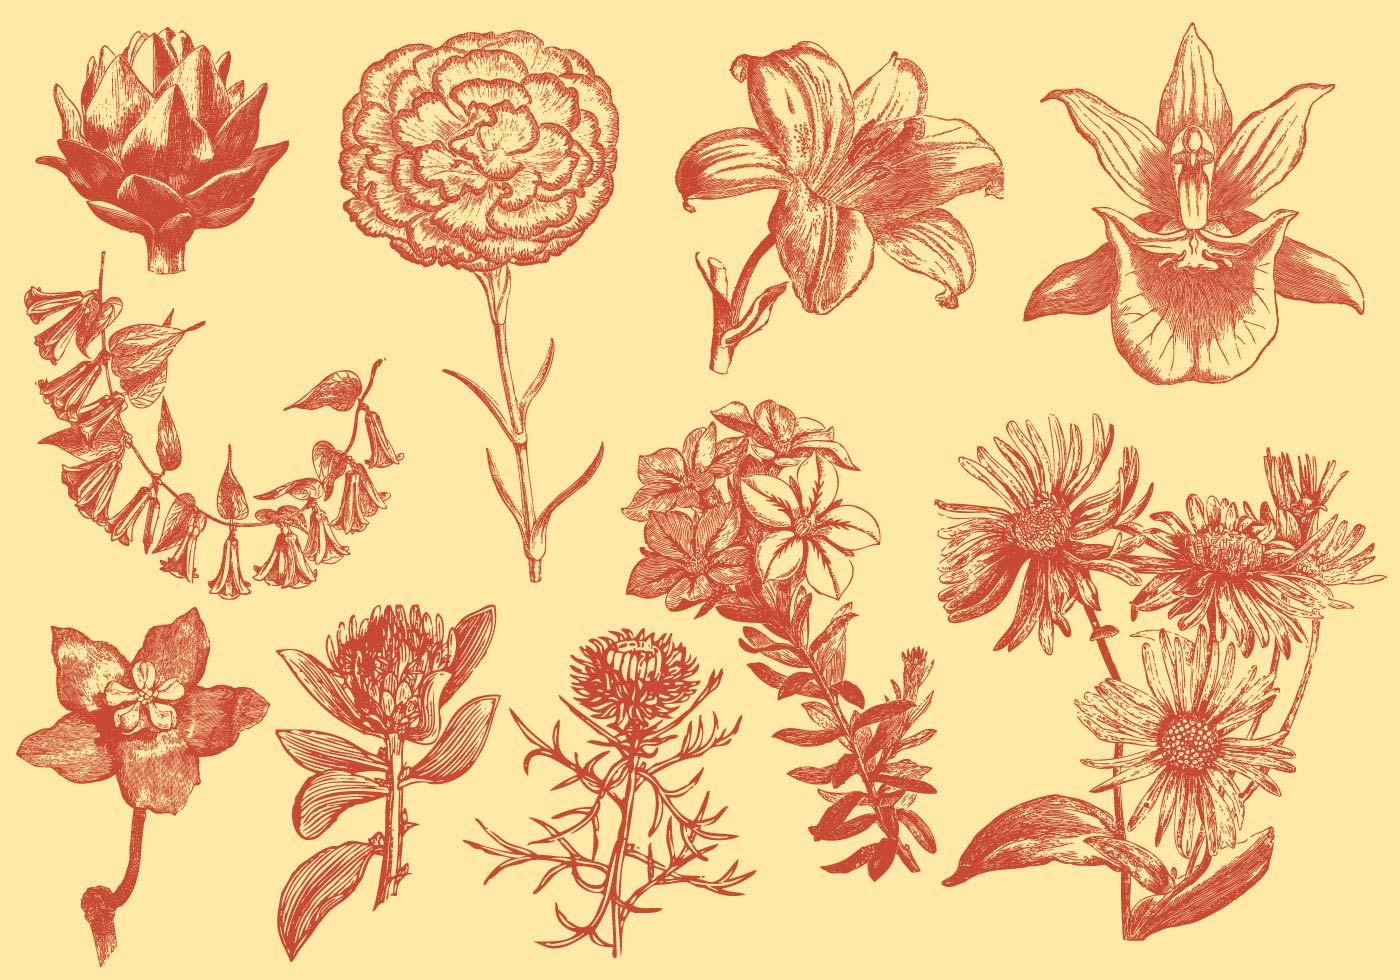 illustrations de fleurs exotiques en